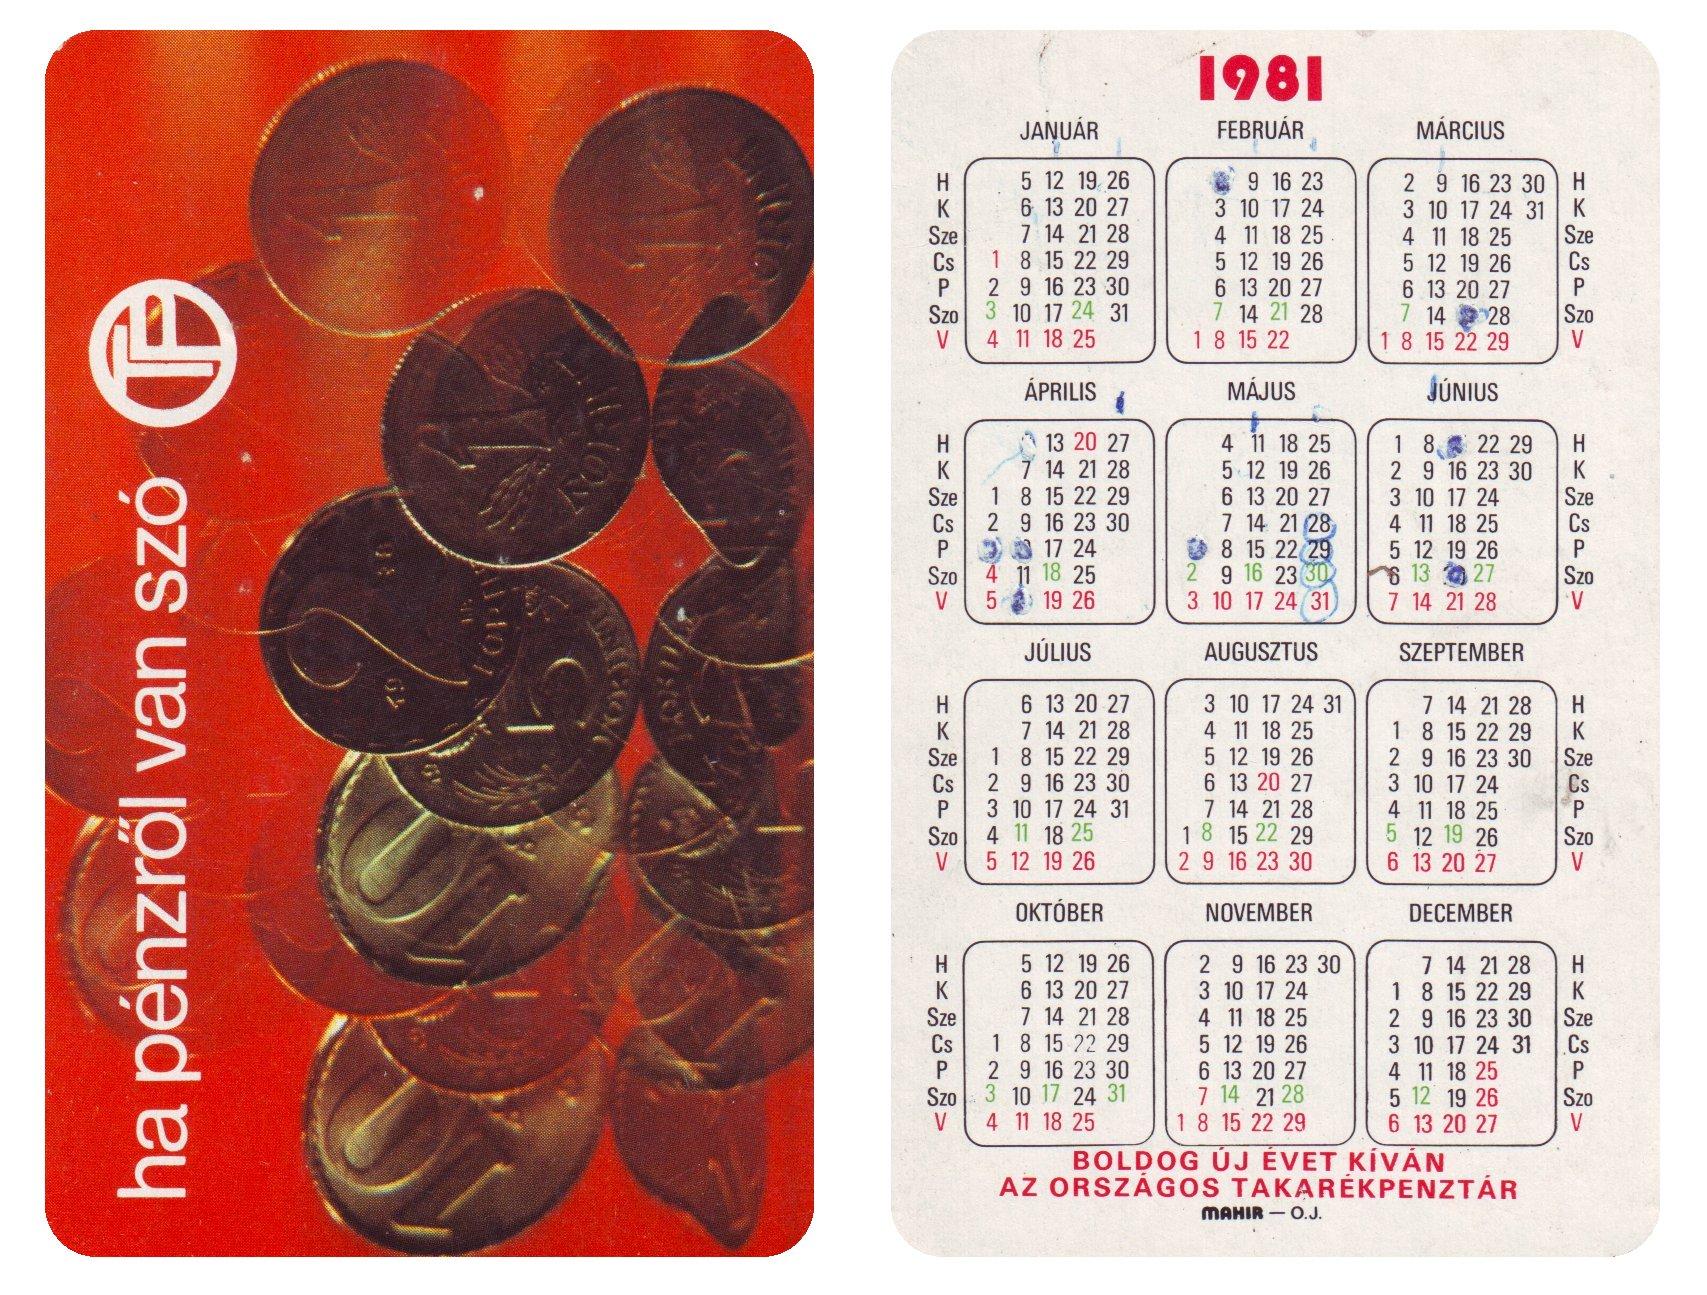 http://www.forintportal.hu/kartyanaptar/www_forintportal_hu_1981_kartyanaptar_022_nagy.jpg